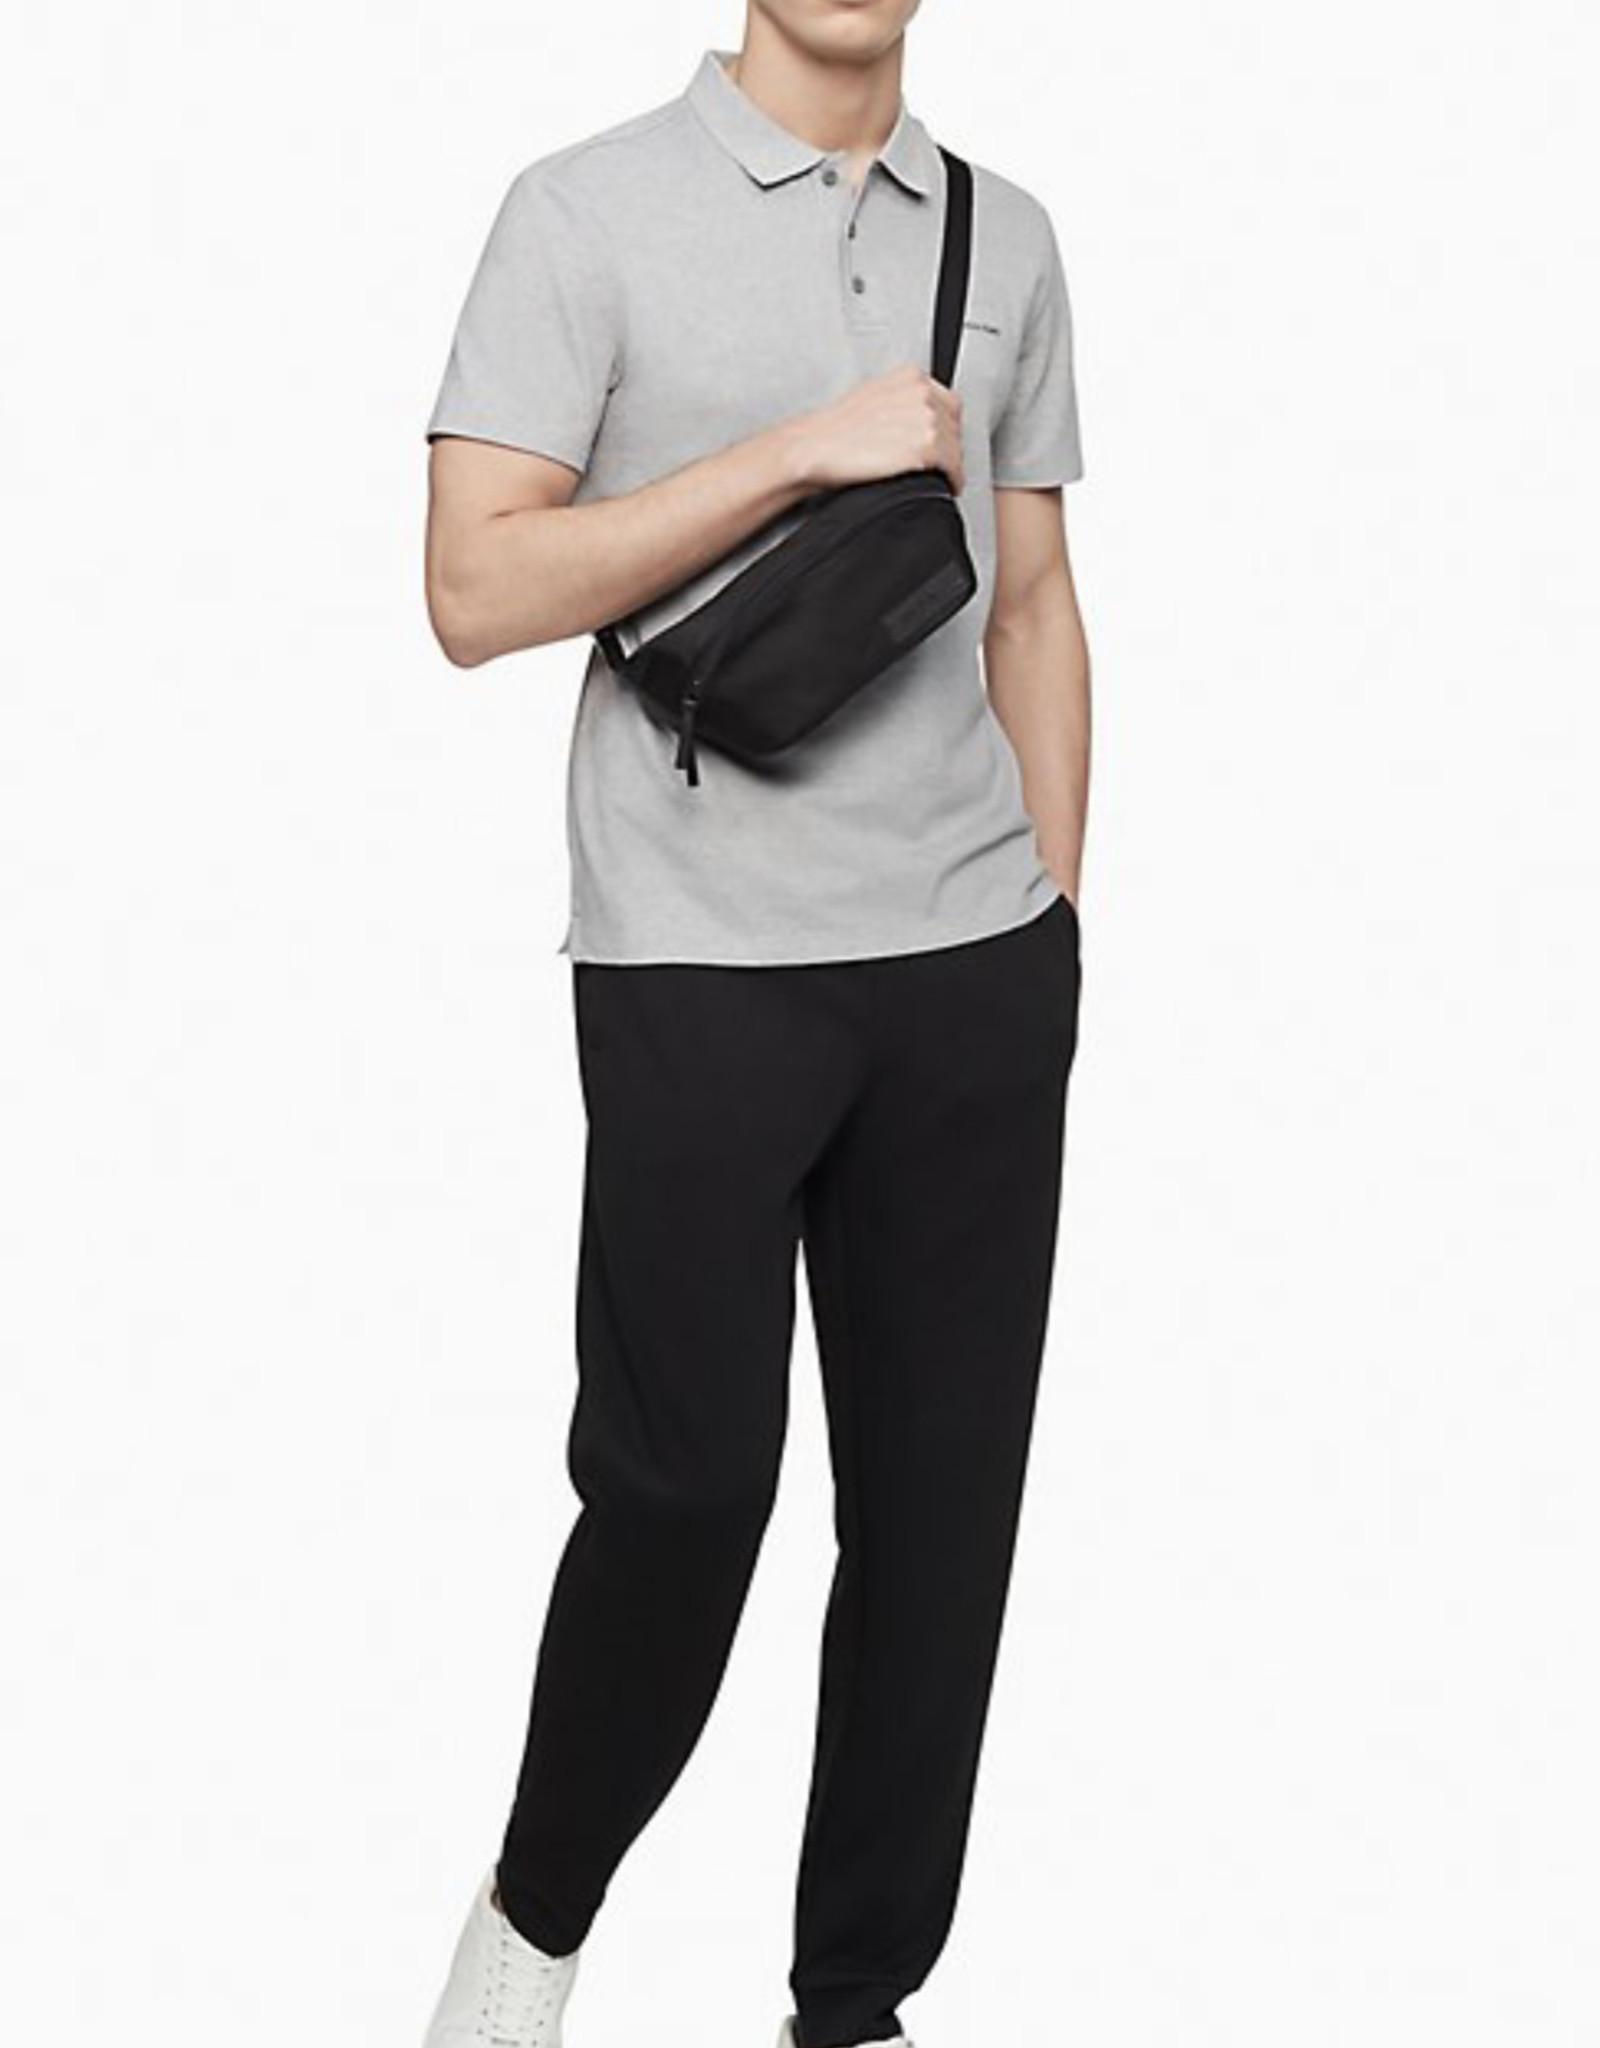 Calvin Klein Calvin Klein Ballistic Nylon Belt Bag Adjustable Strap 2-Way Zip Closure, Logo Patch & Fully Lined Interior